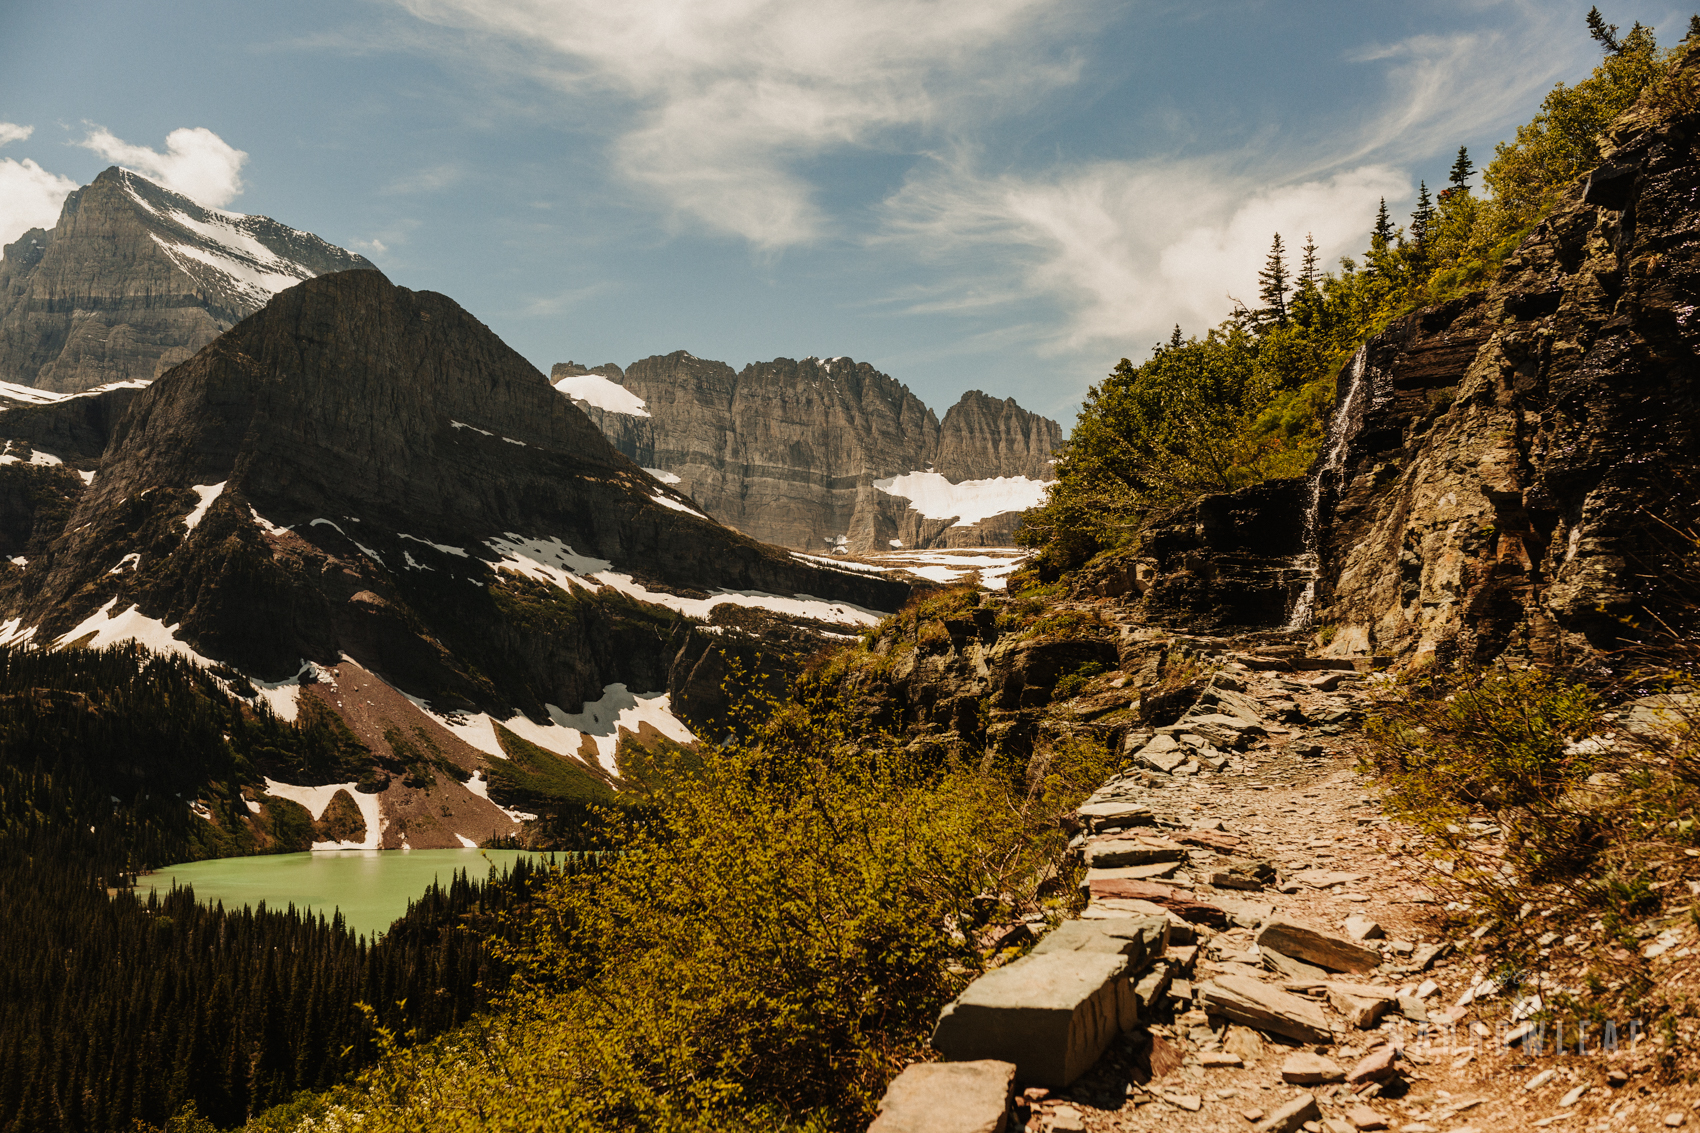 Montana-Glacier-National-Park-Many-Glacier-Narrowleaf-Love-and-Adventure-elopement-Photography-9504.jpg